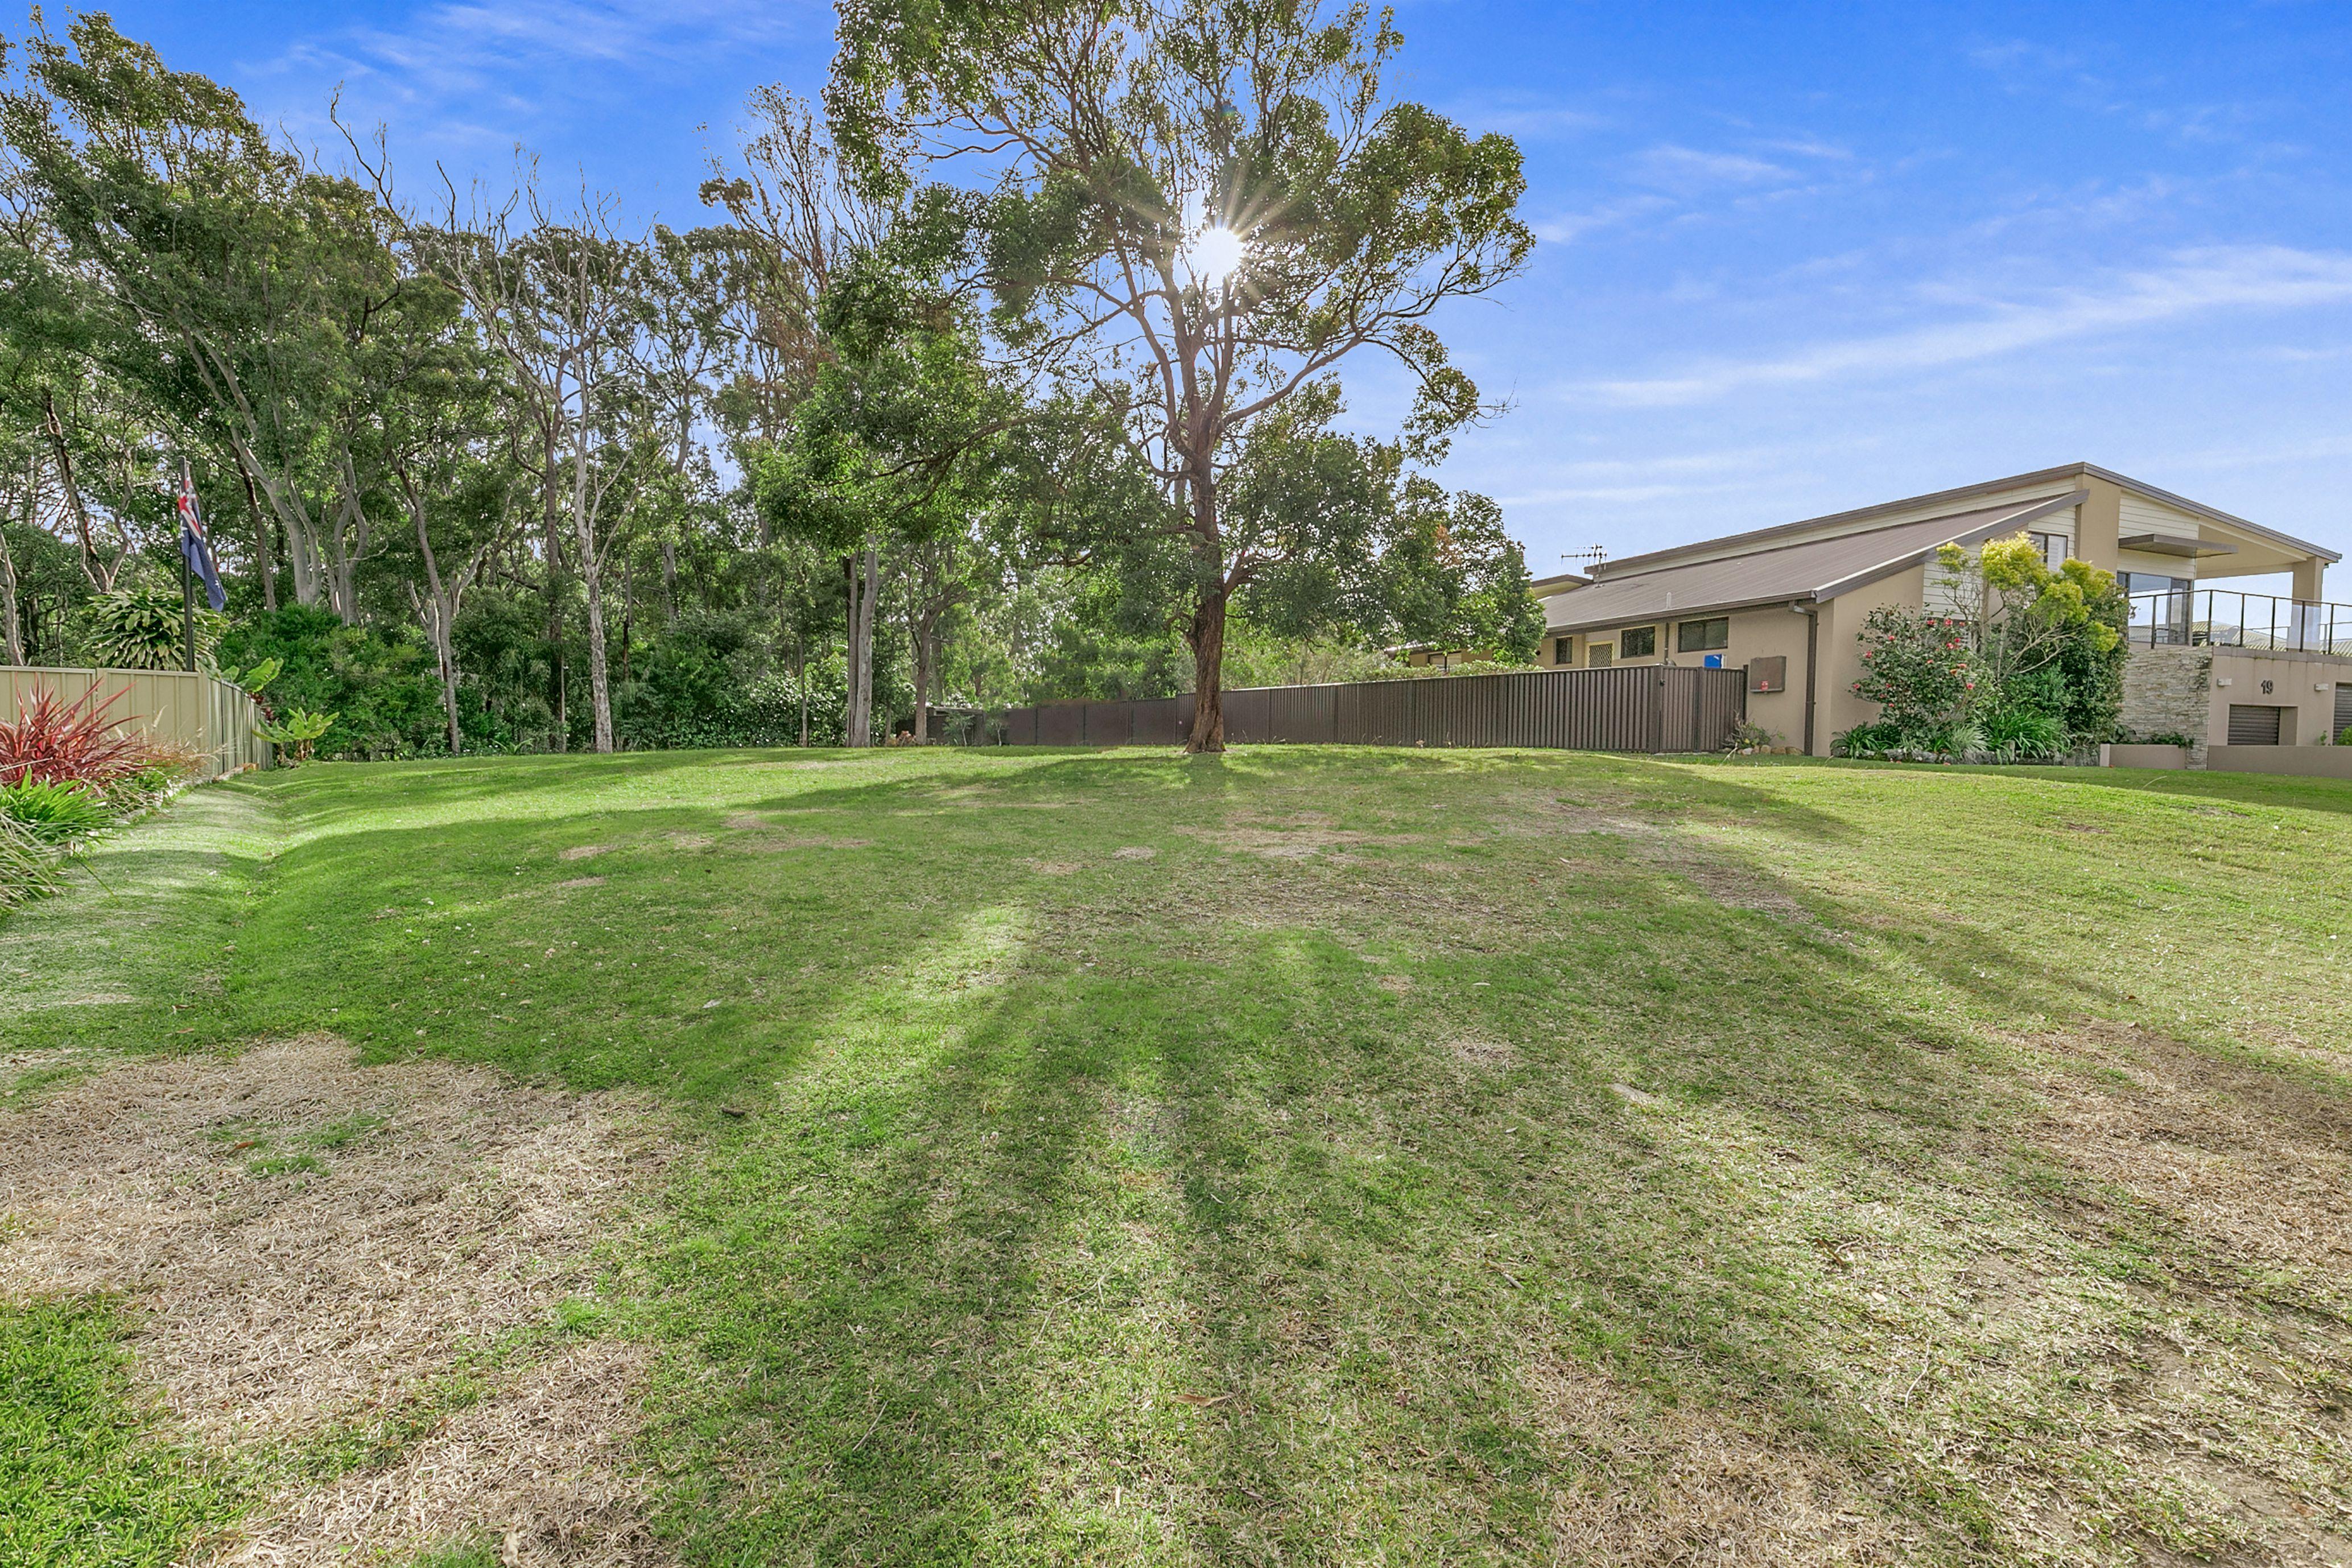 10/DP734959 John Phillip Drive, BONNY HILLS NSW 2445